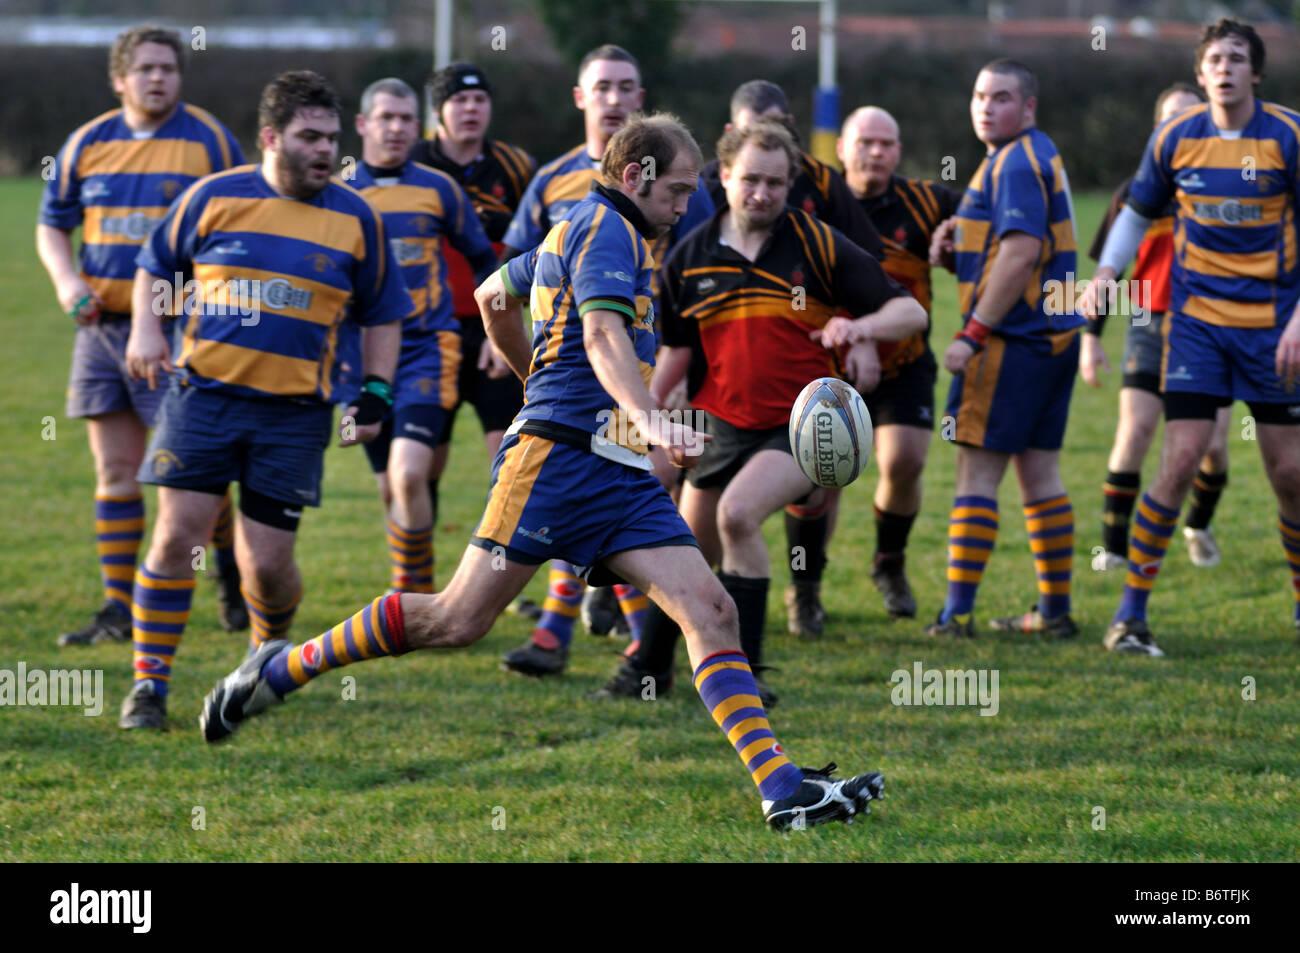 Rugby Union at club level, Leamington Spa, England, UK - Stock Image